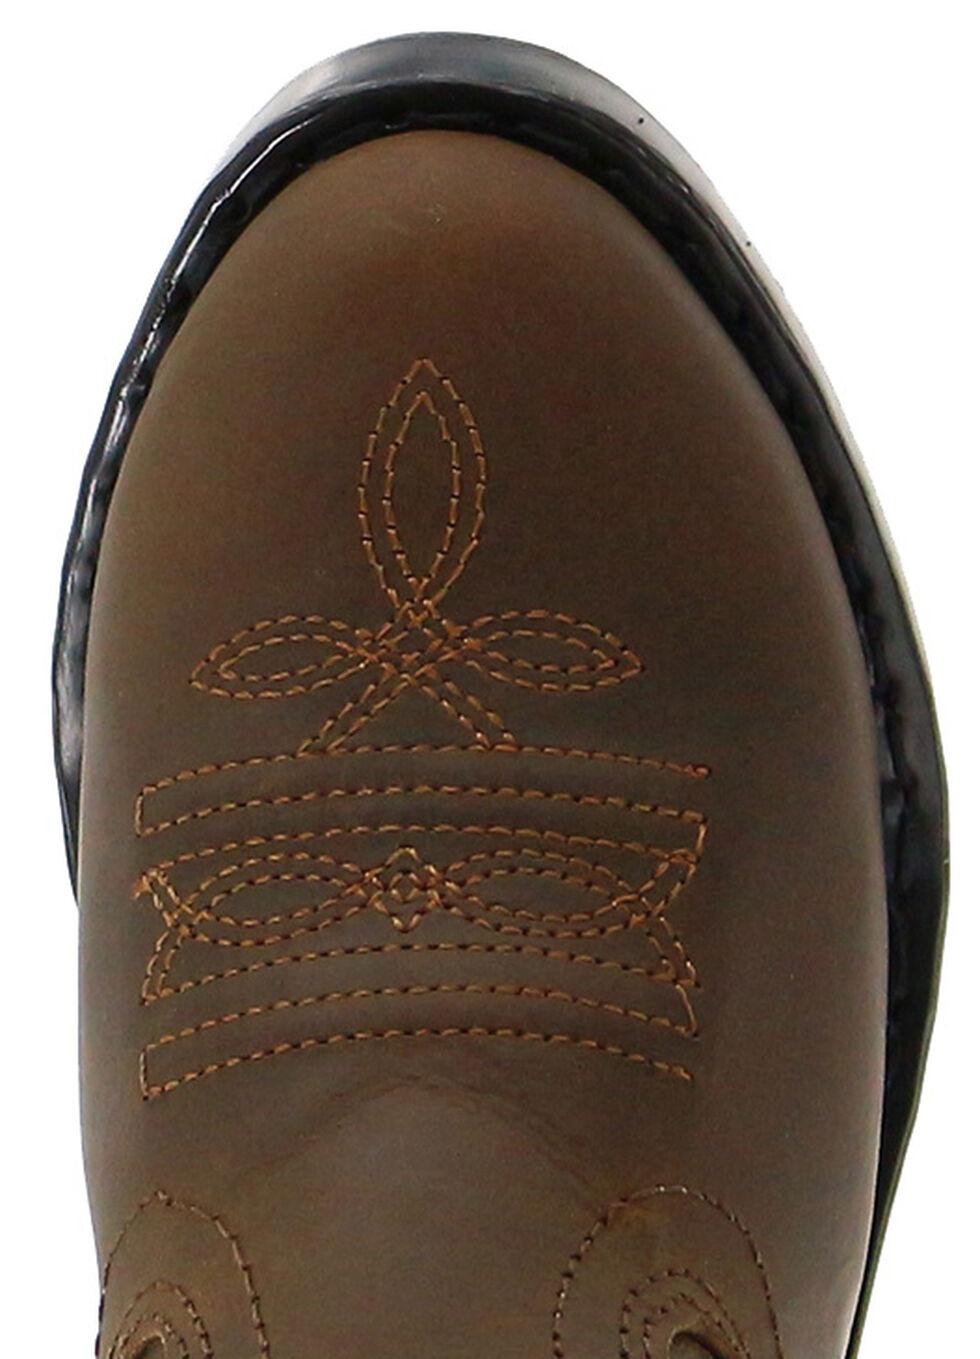 Cody James Children's Brown Western Boots  - Round Toe, Brown, hi-res